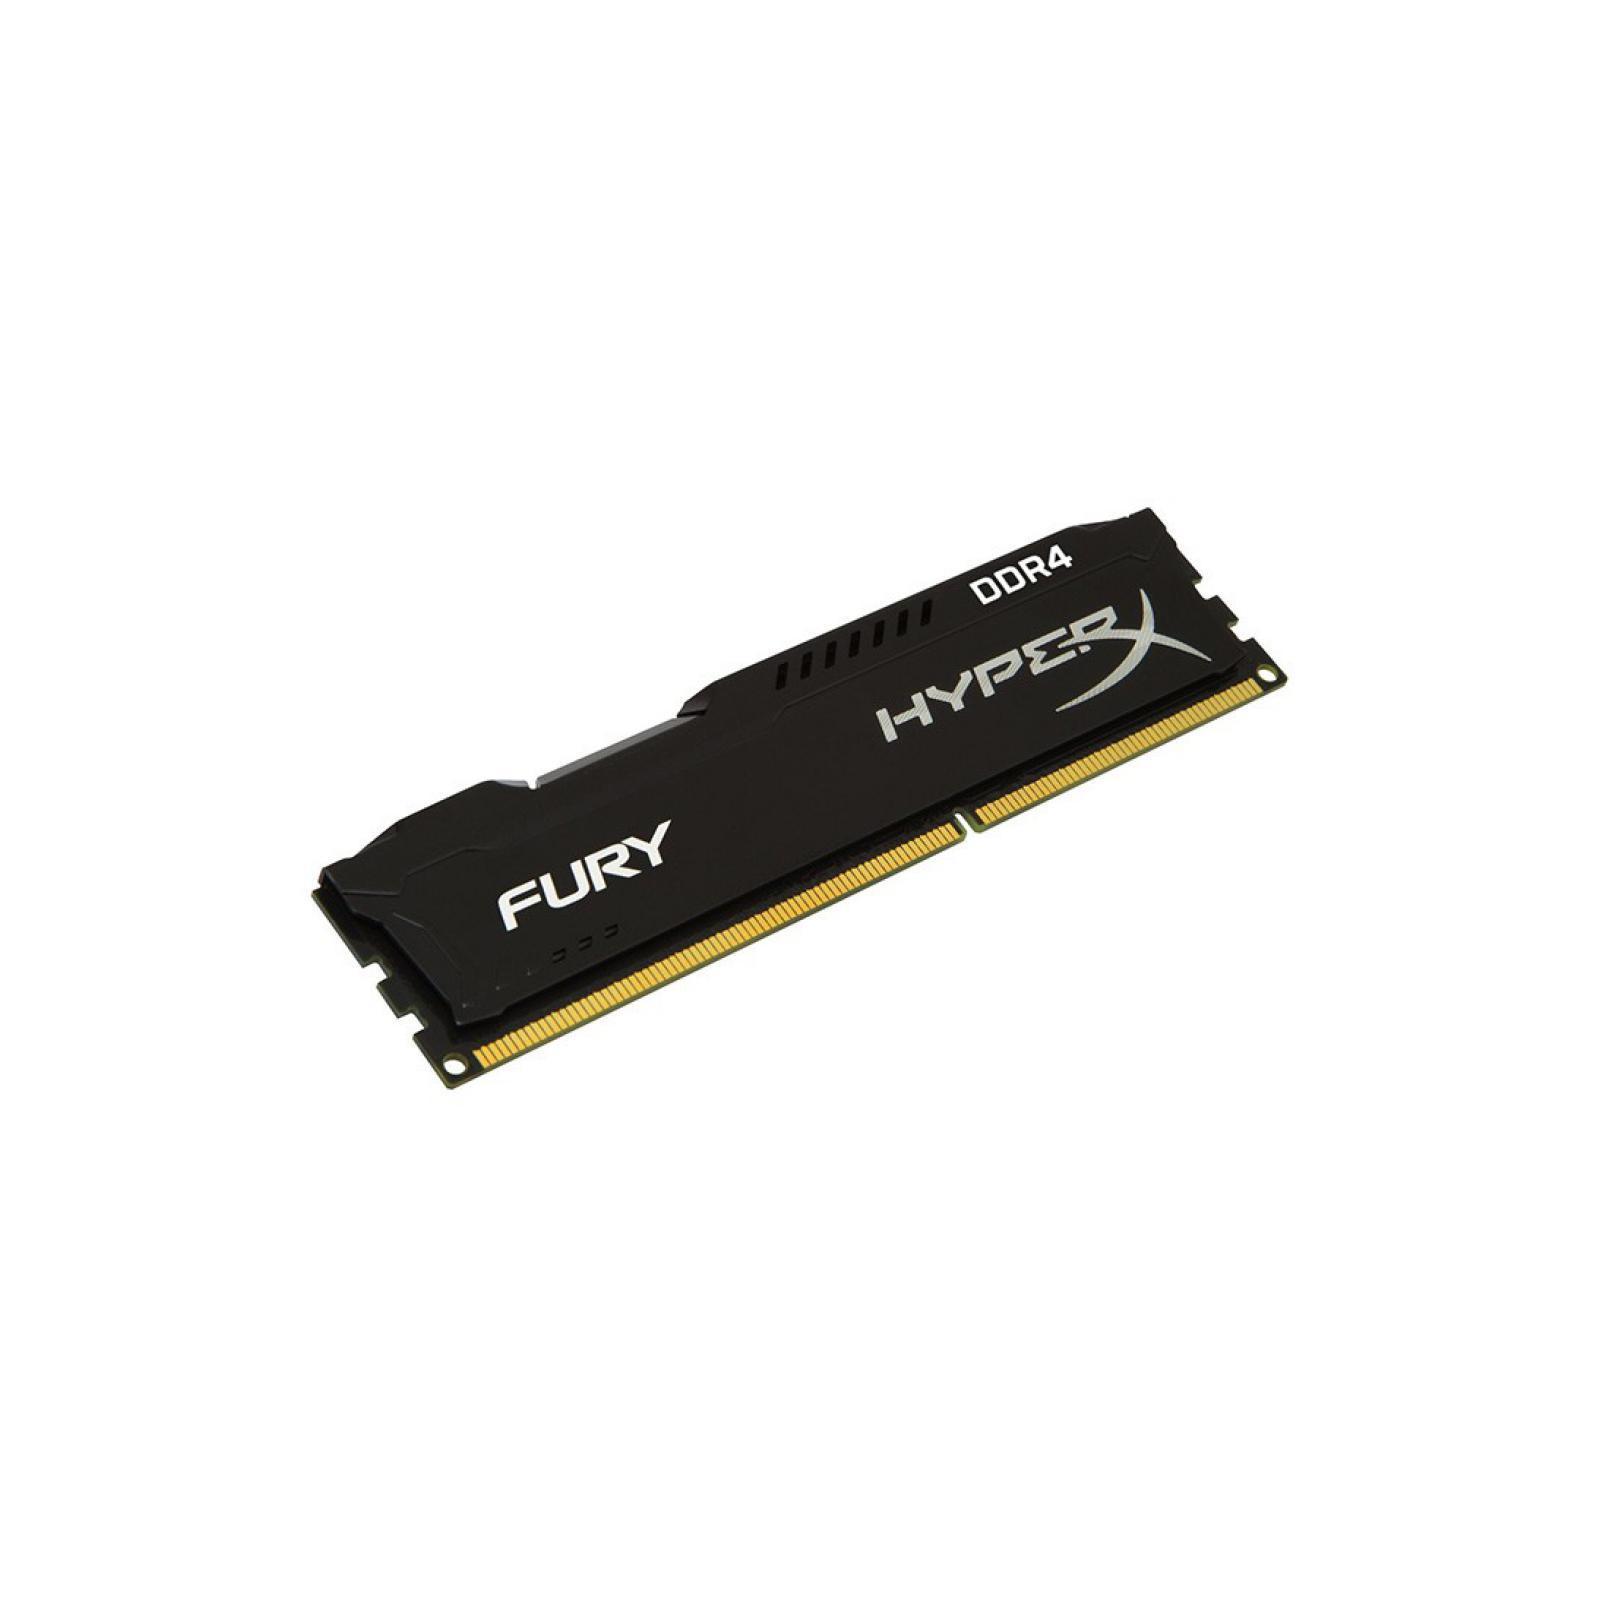 Модуль памяти для компьютера DDR4 16GB 2933 MHz HyperX FURY Black HyperX (Kingston Fury) (HX429C17FB/16) изображение 2